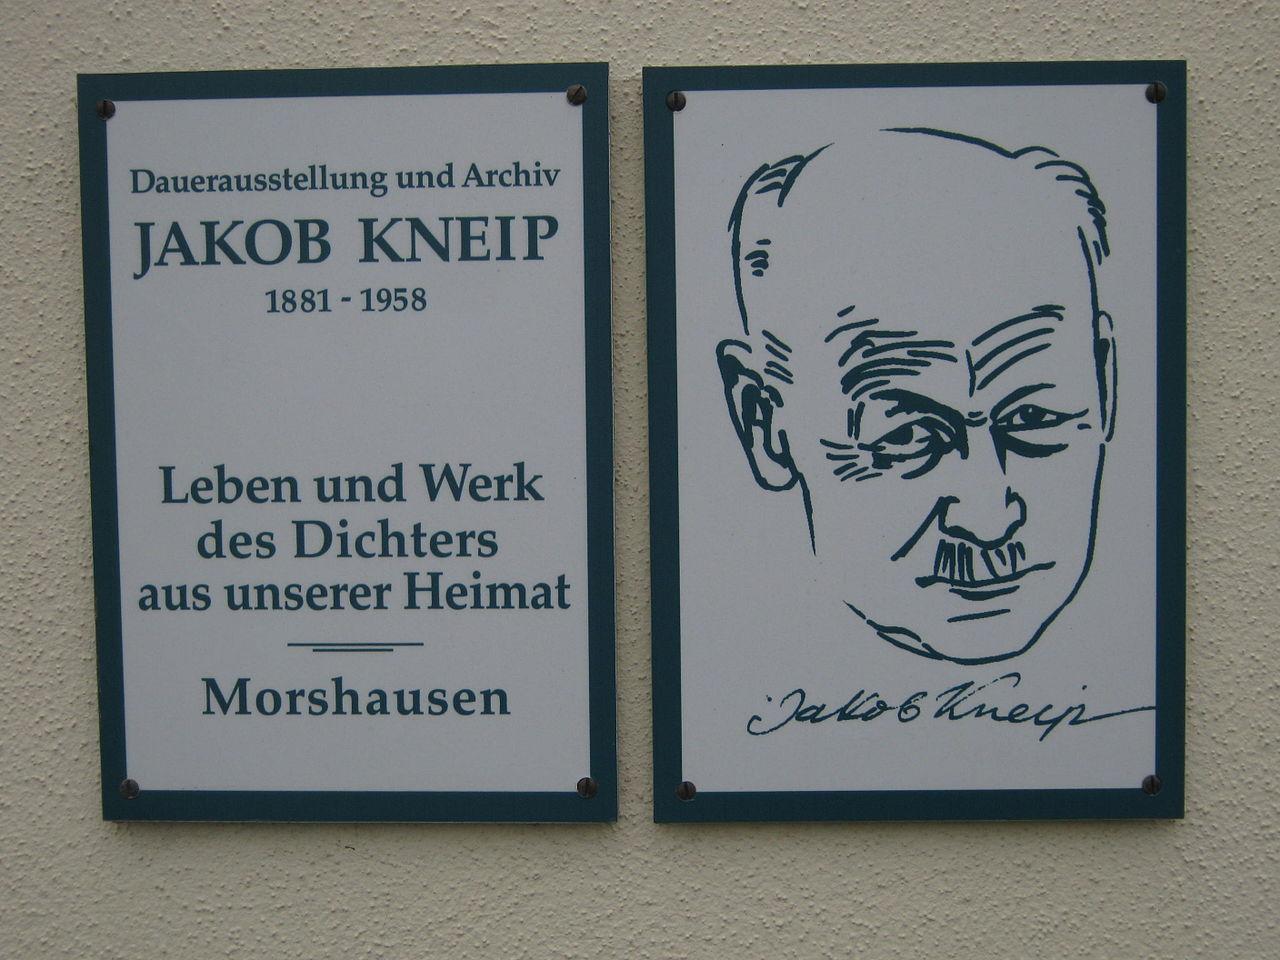 Bild Jakob Kneip Museum Morshausen